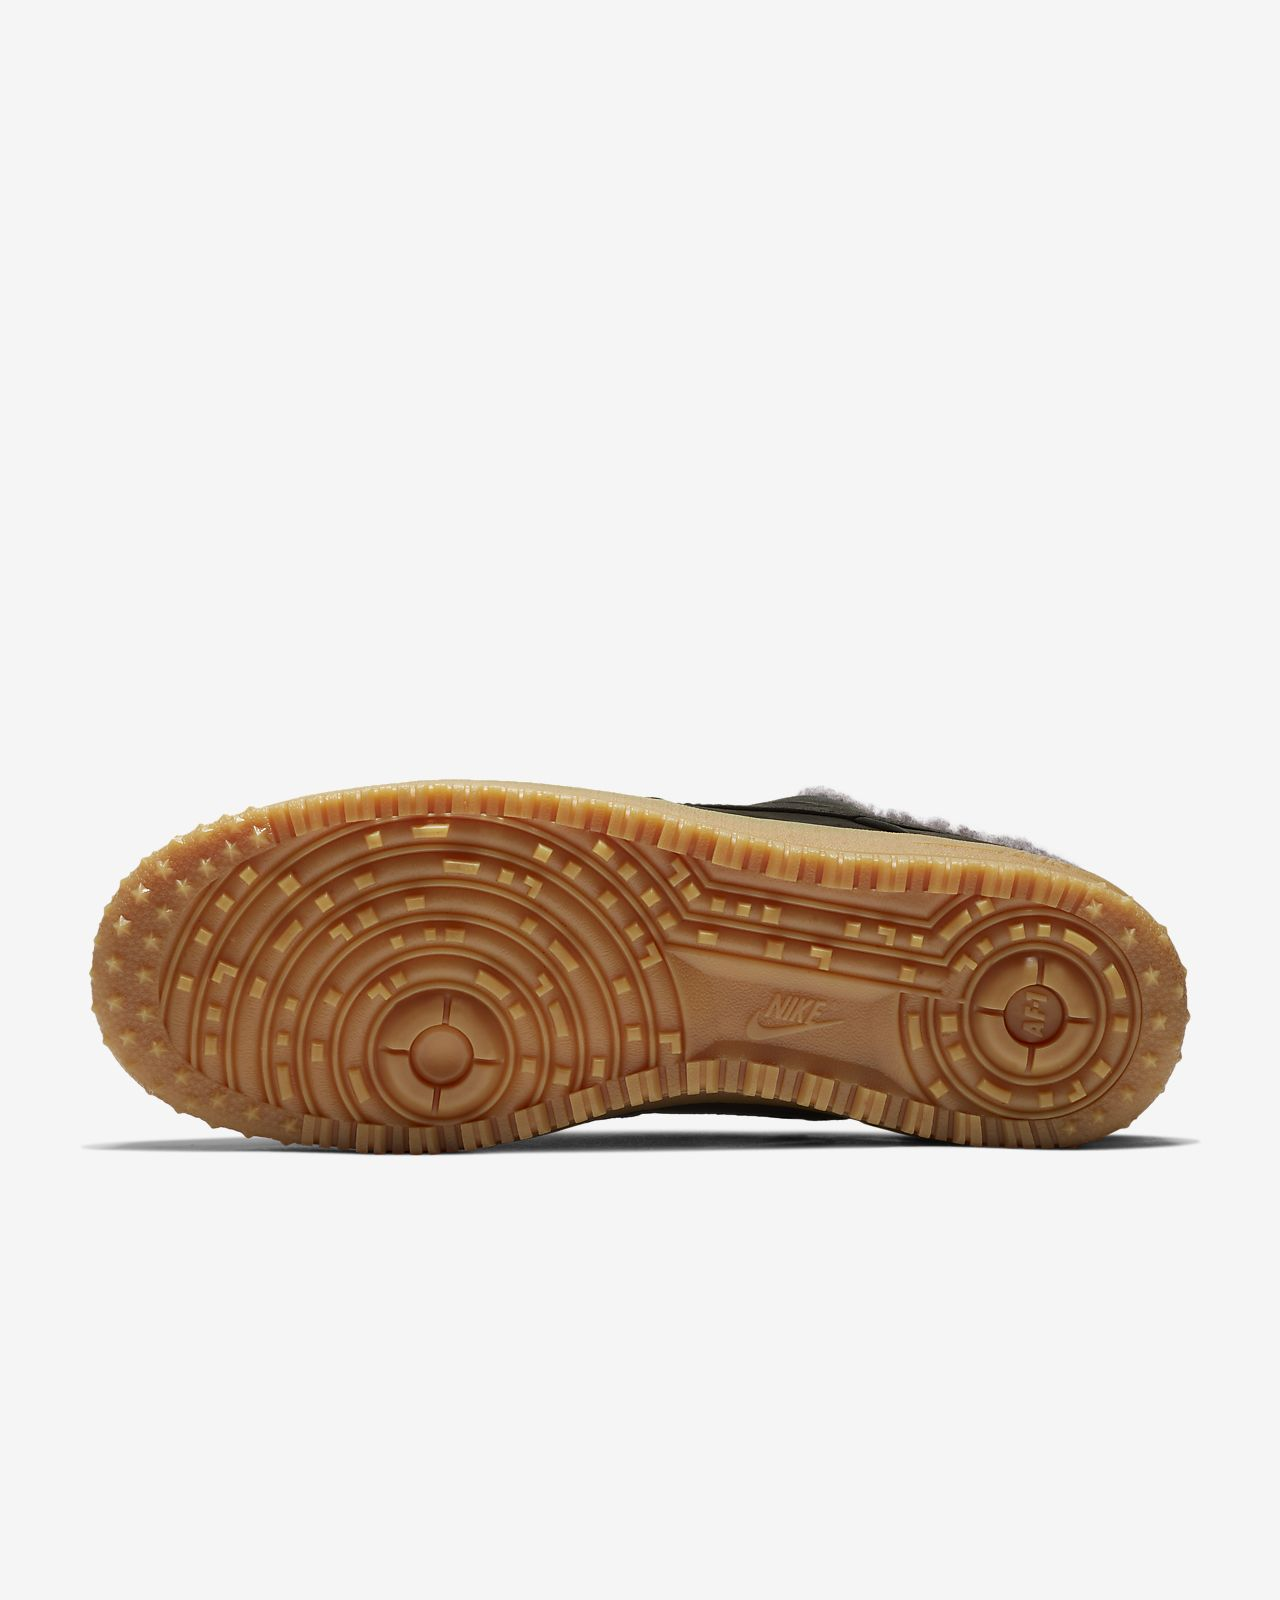 Men's Shoe Air Nike Force 1 Premium Winter 6gyIfbvY7